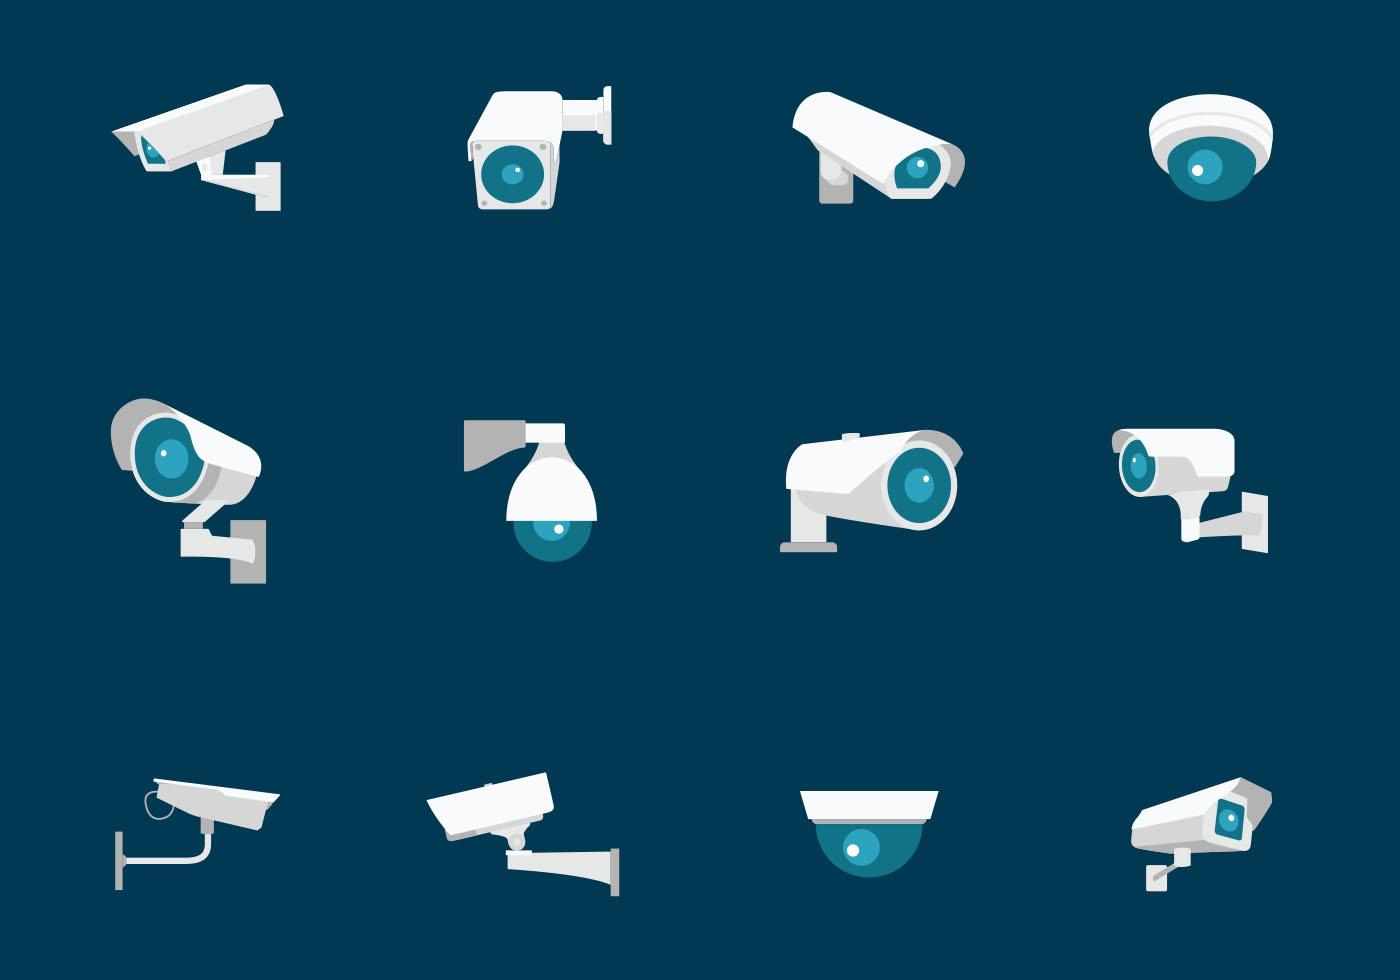 Cctv Security Camera Download Free Vector Art Stock